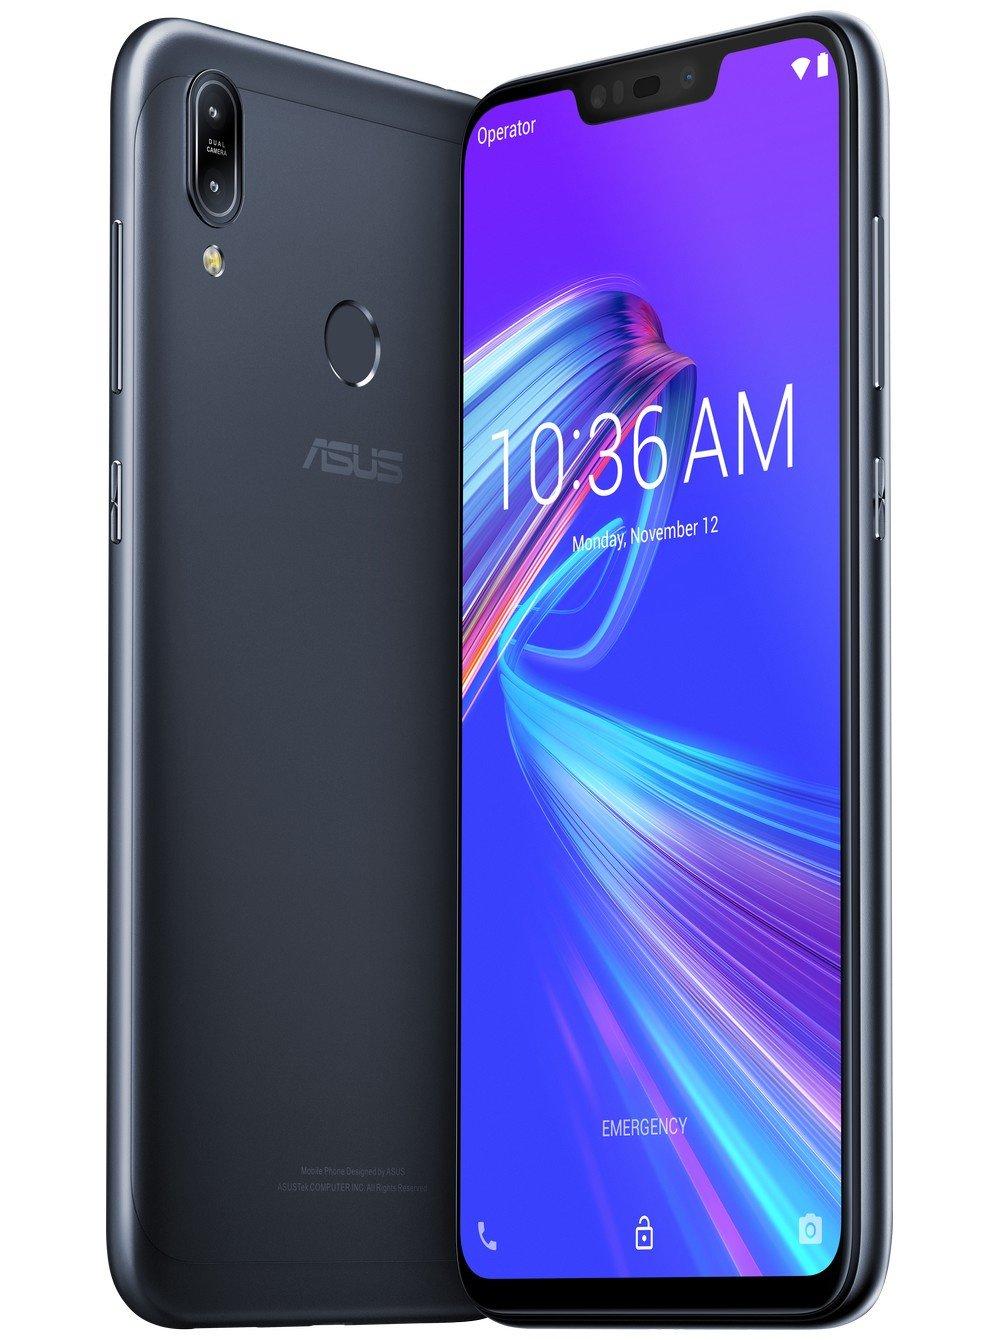 Смартфон Asus ZenFone Max (M2) (ZB633KL-4A070EU) 4/32 GB DUALSIM Black с чехлом фото 8